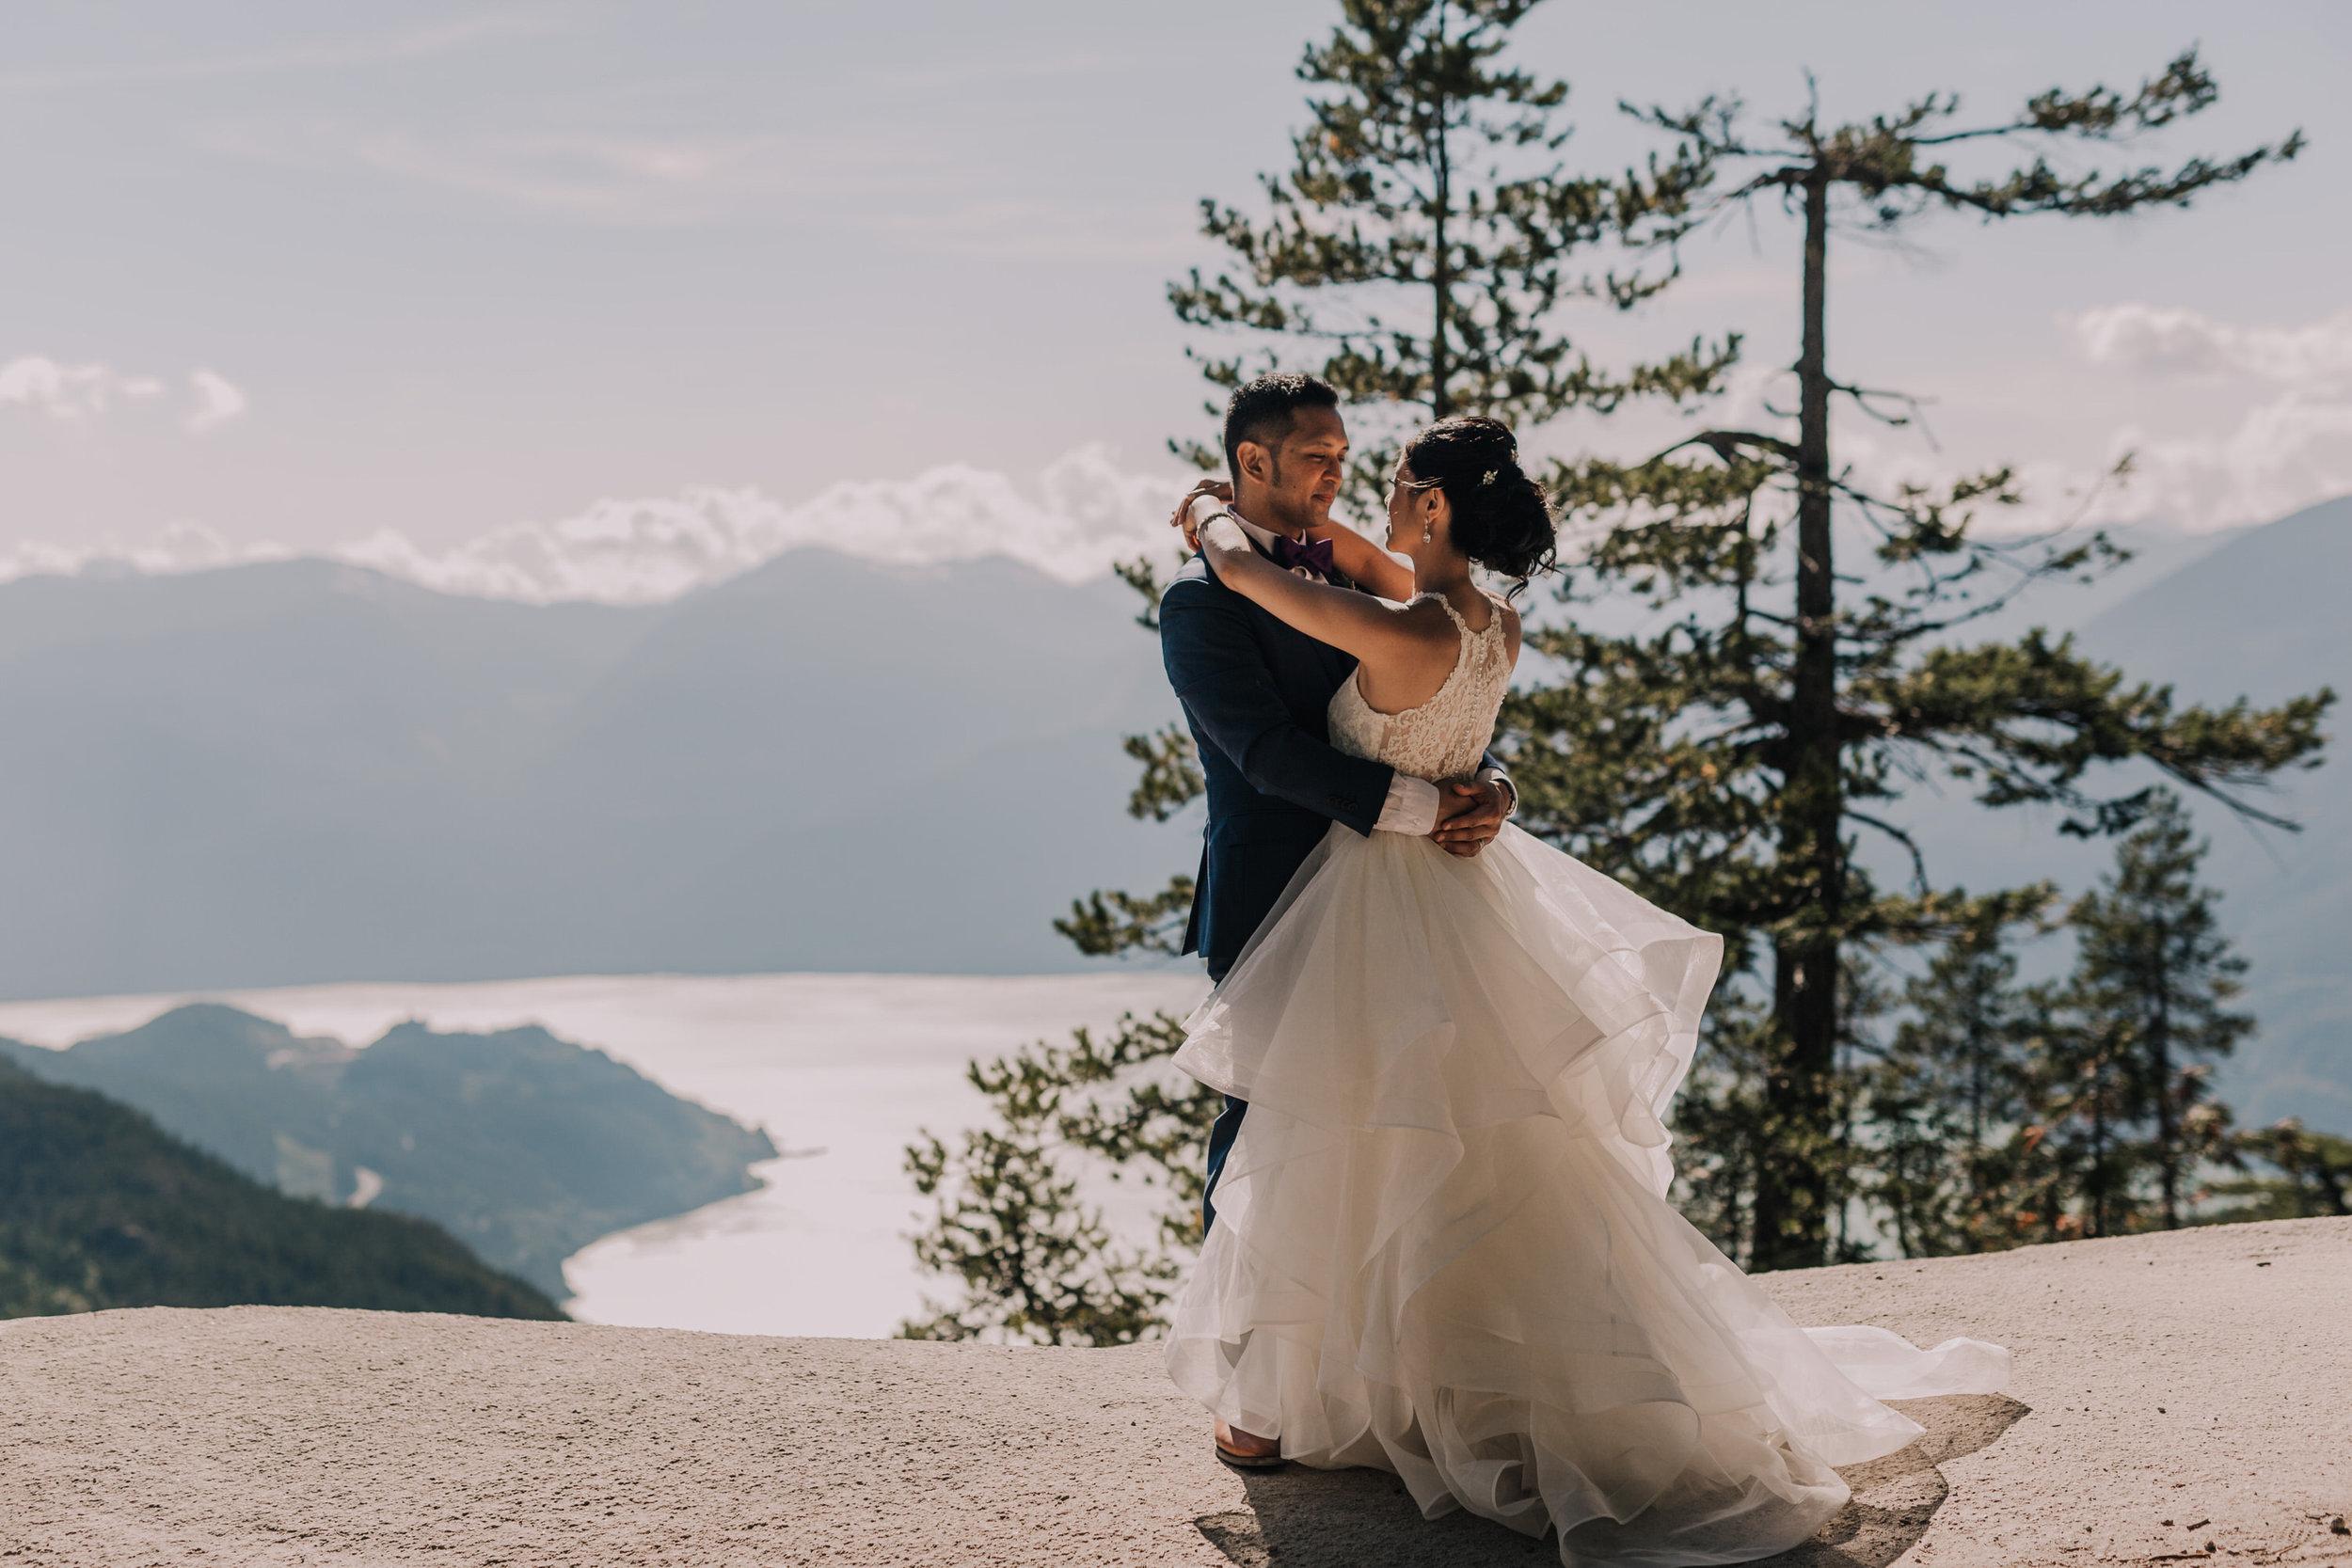 Squamish Wedding Photographer - Sea to Sky Gondola Wedding Photos -  Vancouver Wedding Photographer & Videographer - Sunshine Coast Wedding Photos - Sunshine Coast Wedding Photographer - Jennifer Picard Photography - IMG_3541.jpg